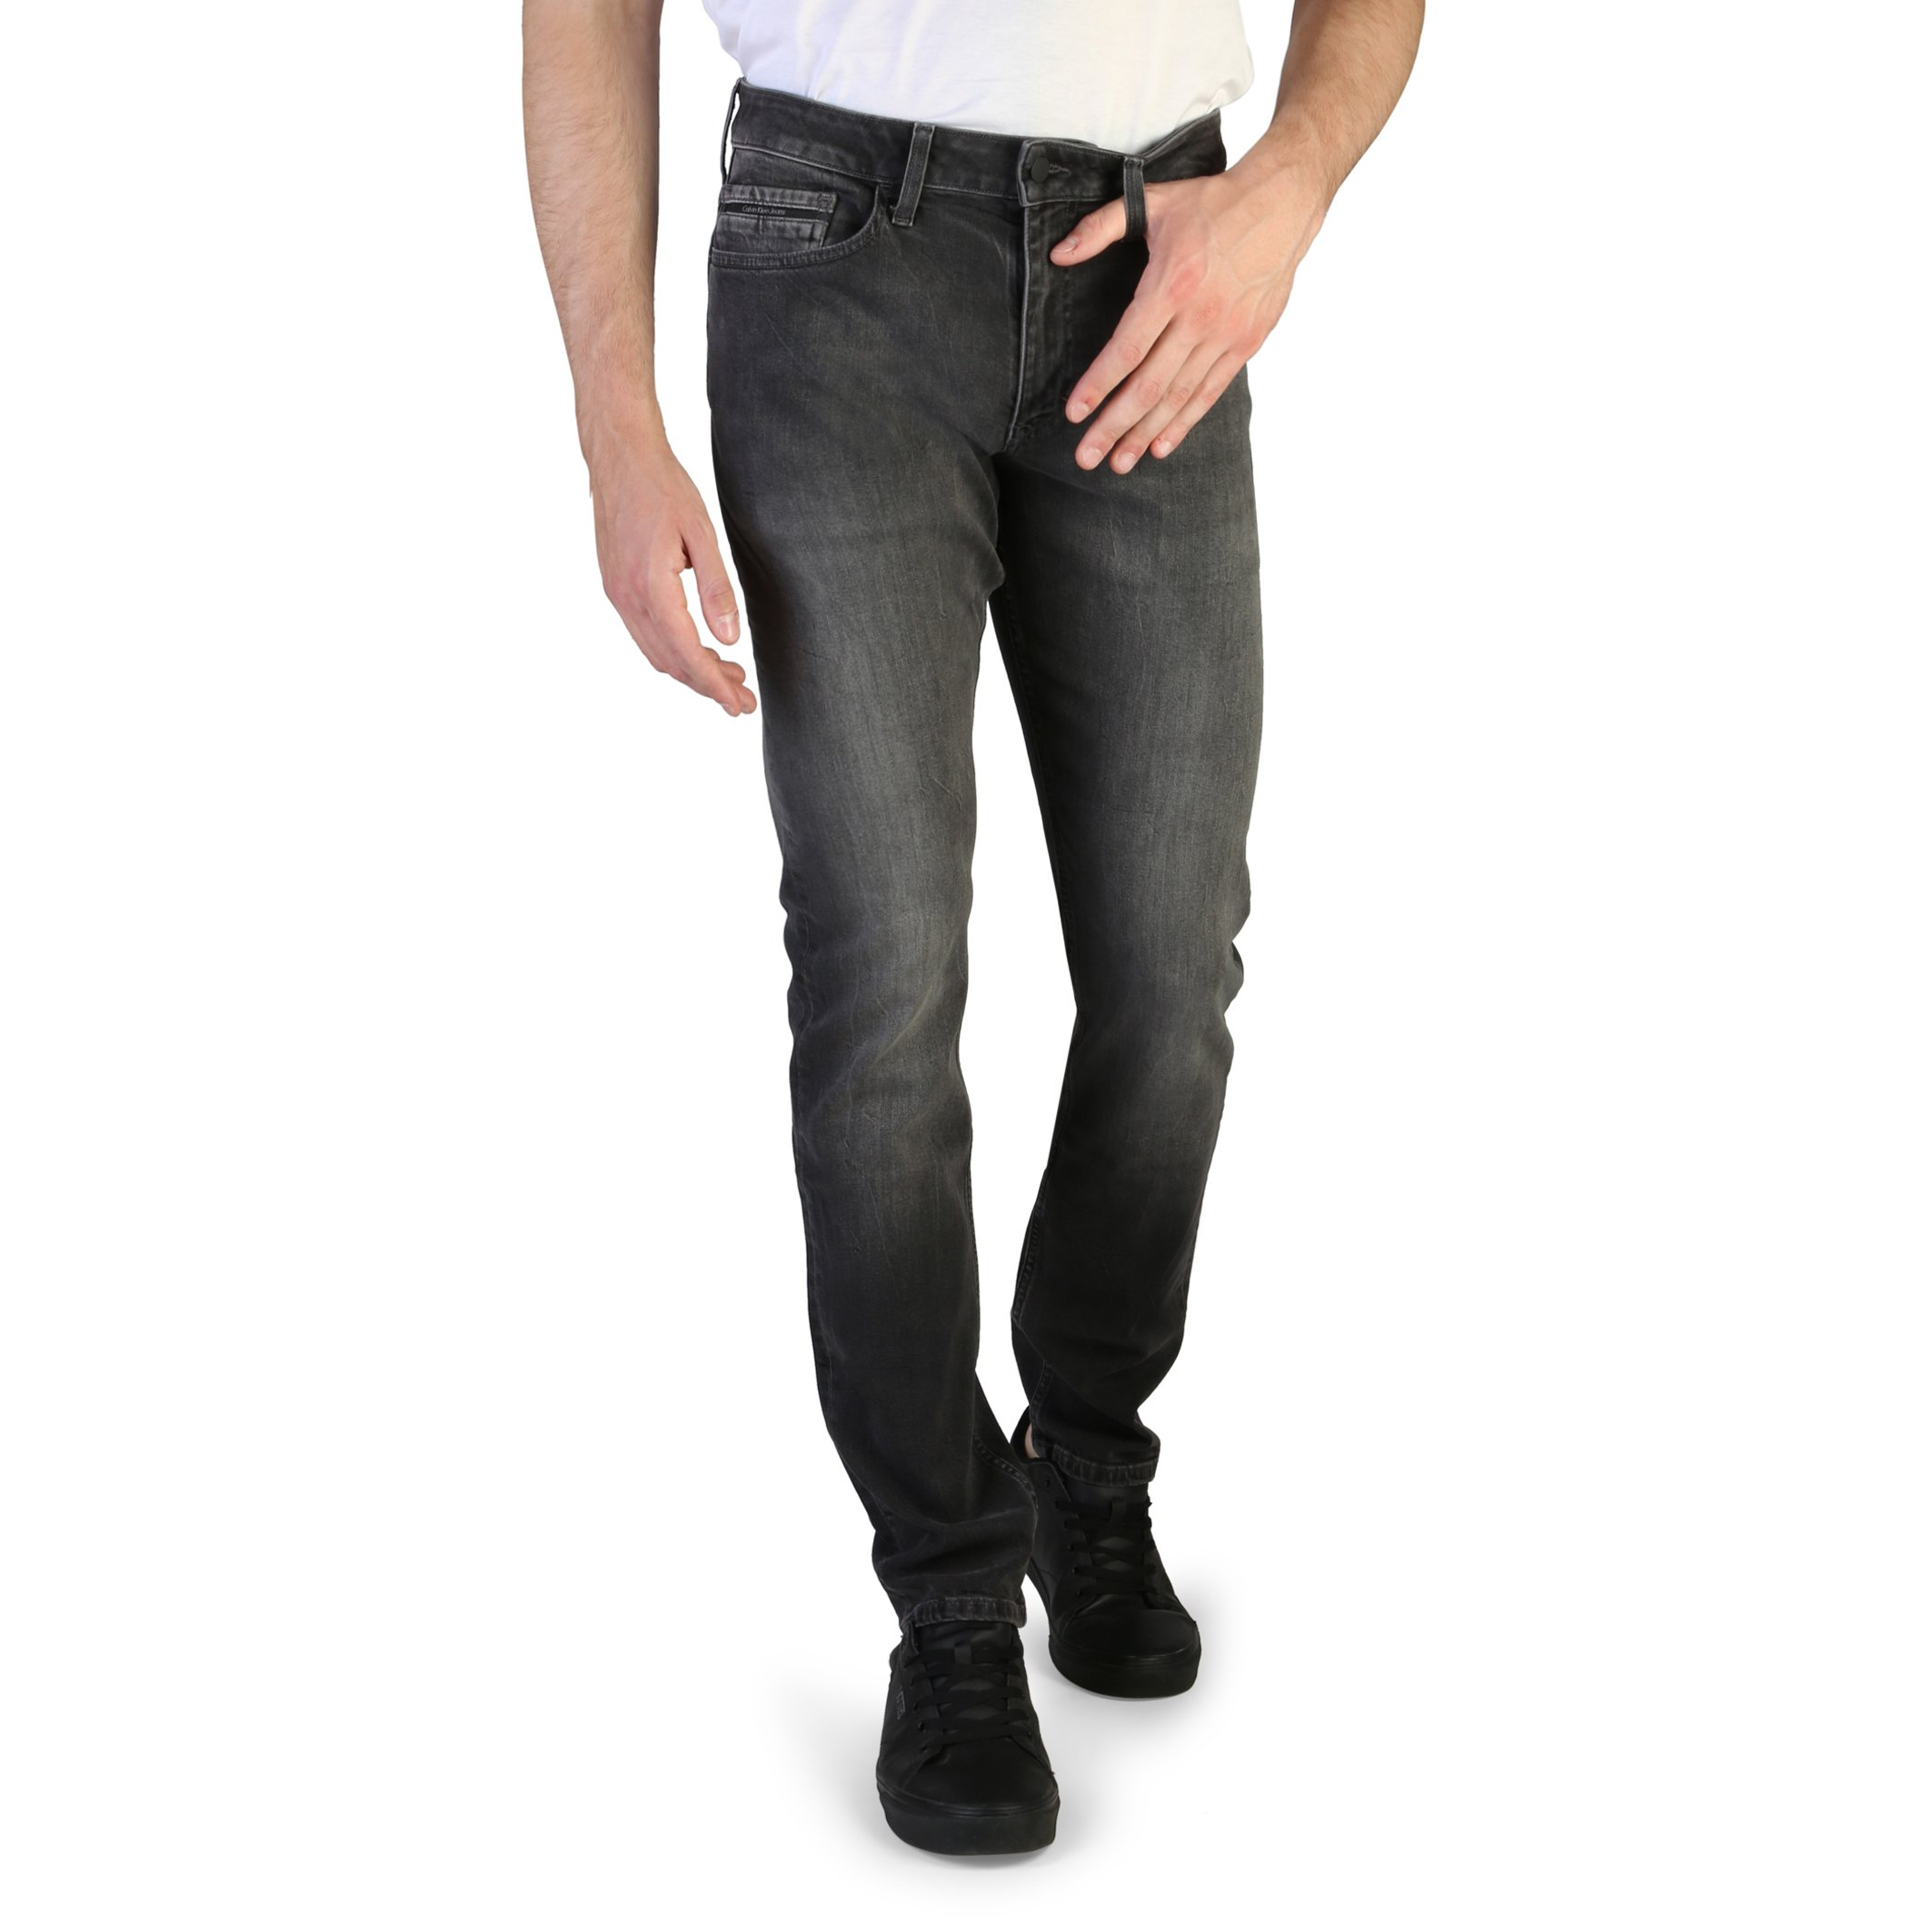 Calvin Klein Men's Jeans Grey J30J305762 - grey-2 30